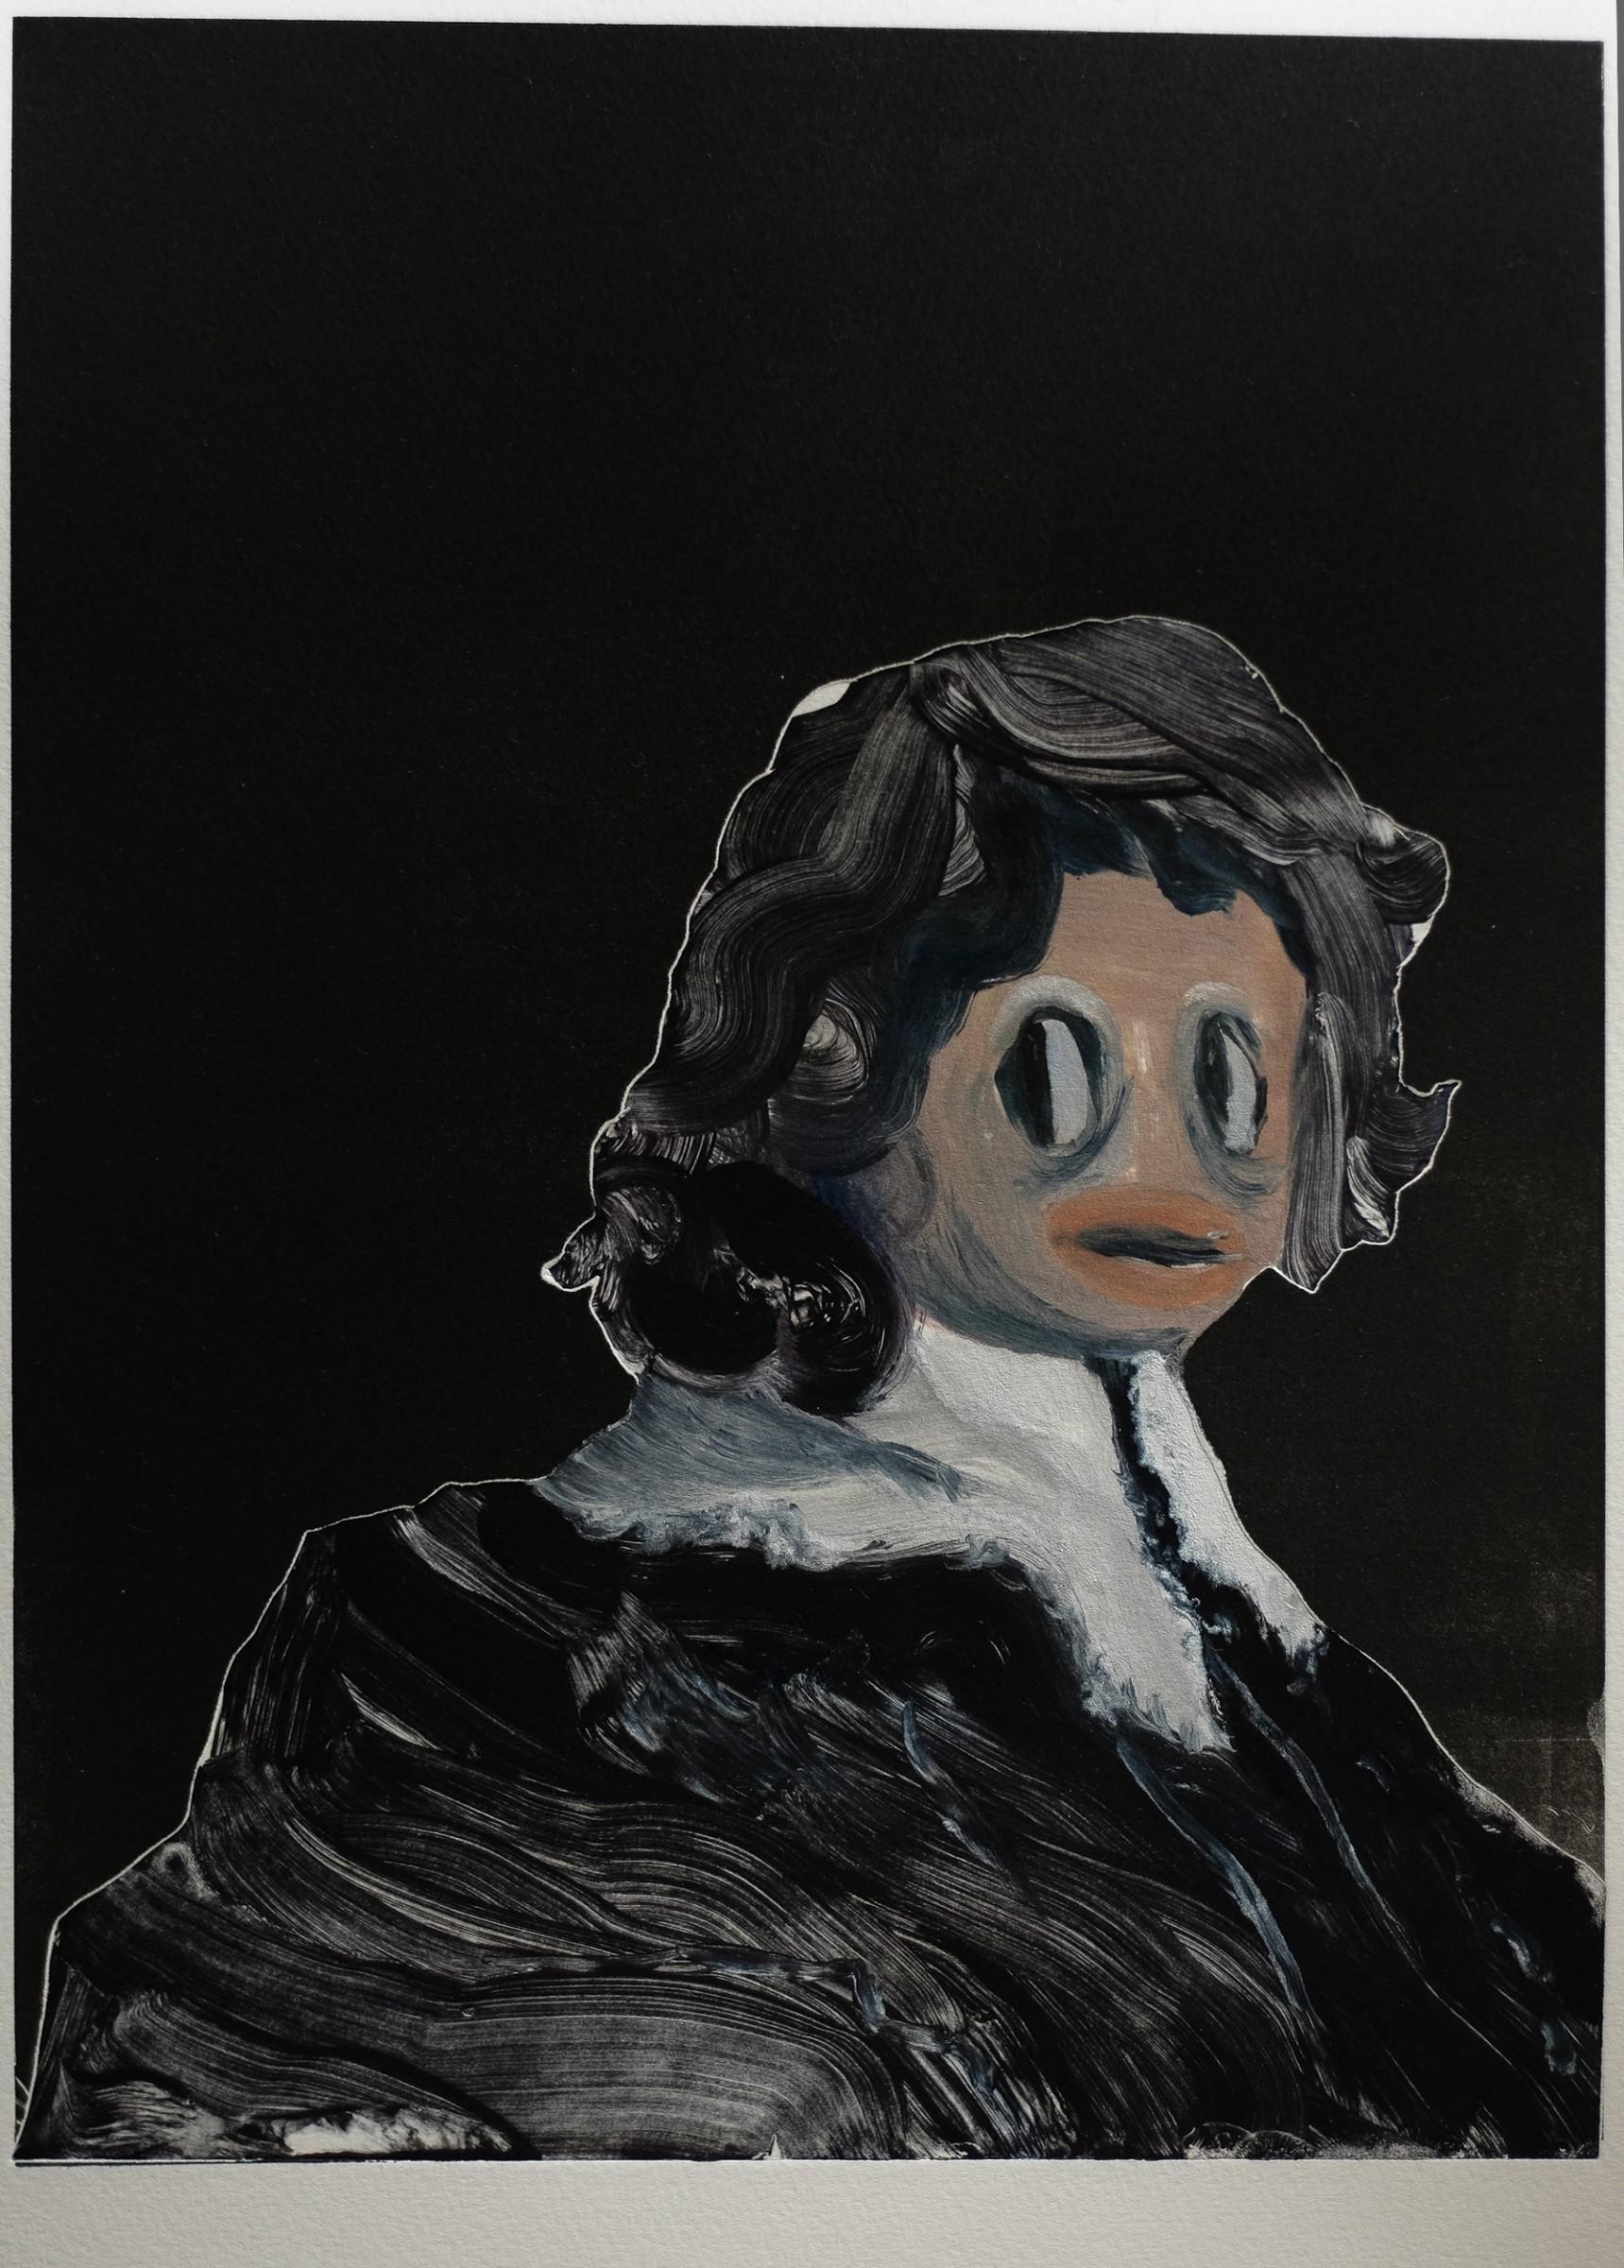 "<span class=""link fancybox-details-link""><a href=""/exhibitions/17/works/image_standalone752/"">View Detail Page</a></span><p><strong>Natasha Michaels</strong></p><p>Important Man</p><p>monoprint 1/1</p><p>41 x 31cm</p><p>£670</p>"